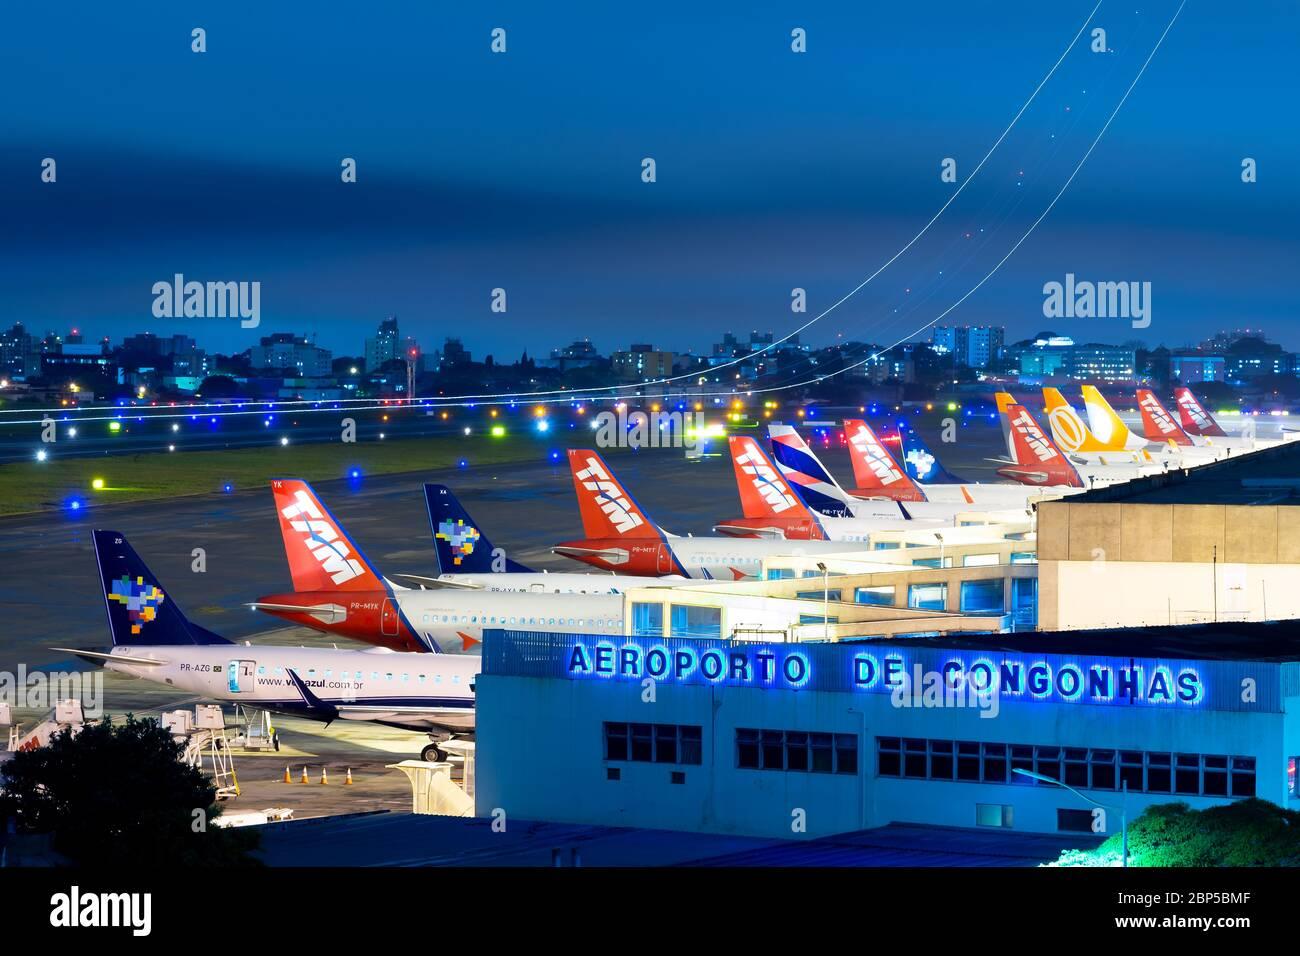 sao-paulo-congonhas-airport-showing-mult